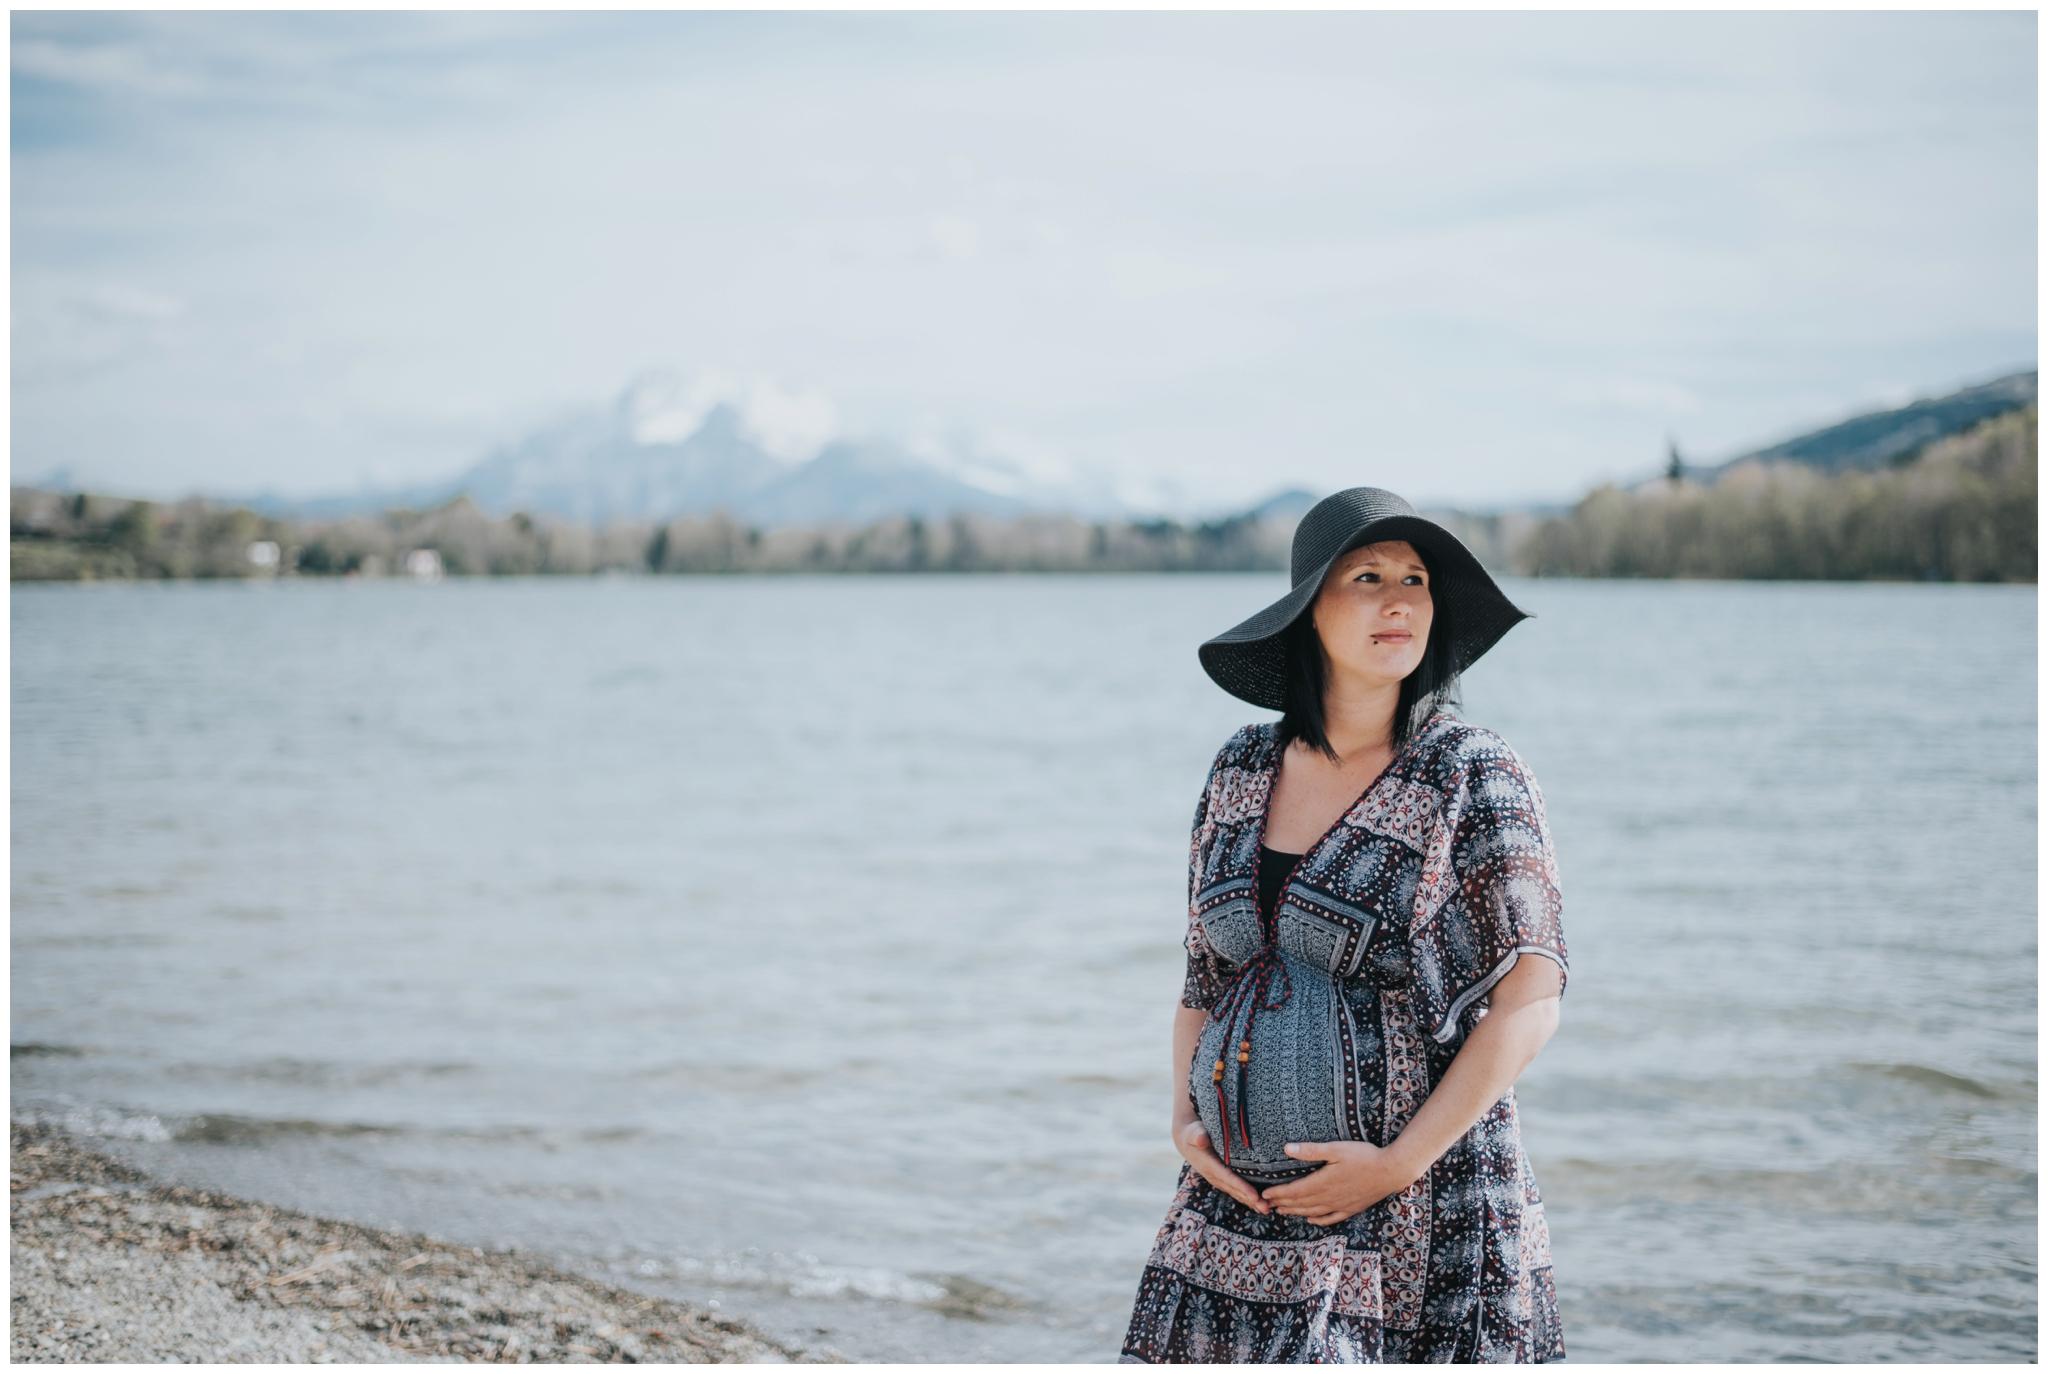 photographe grossesse future maman grenoble annecy lyon naturel lifestyle lac nouveau ne maternite famille seance photo famille _022